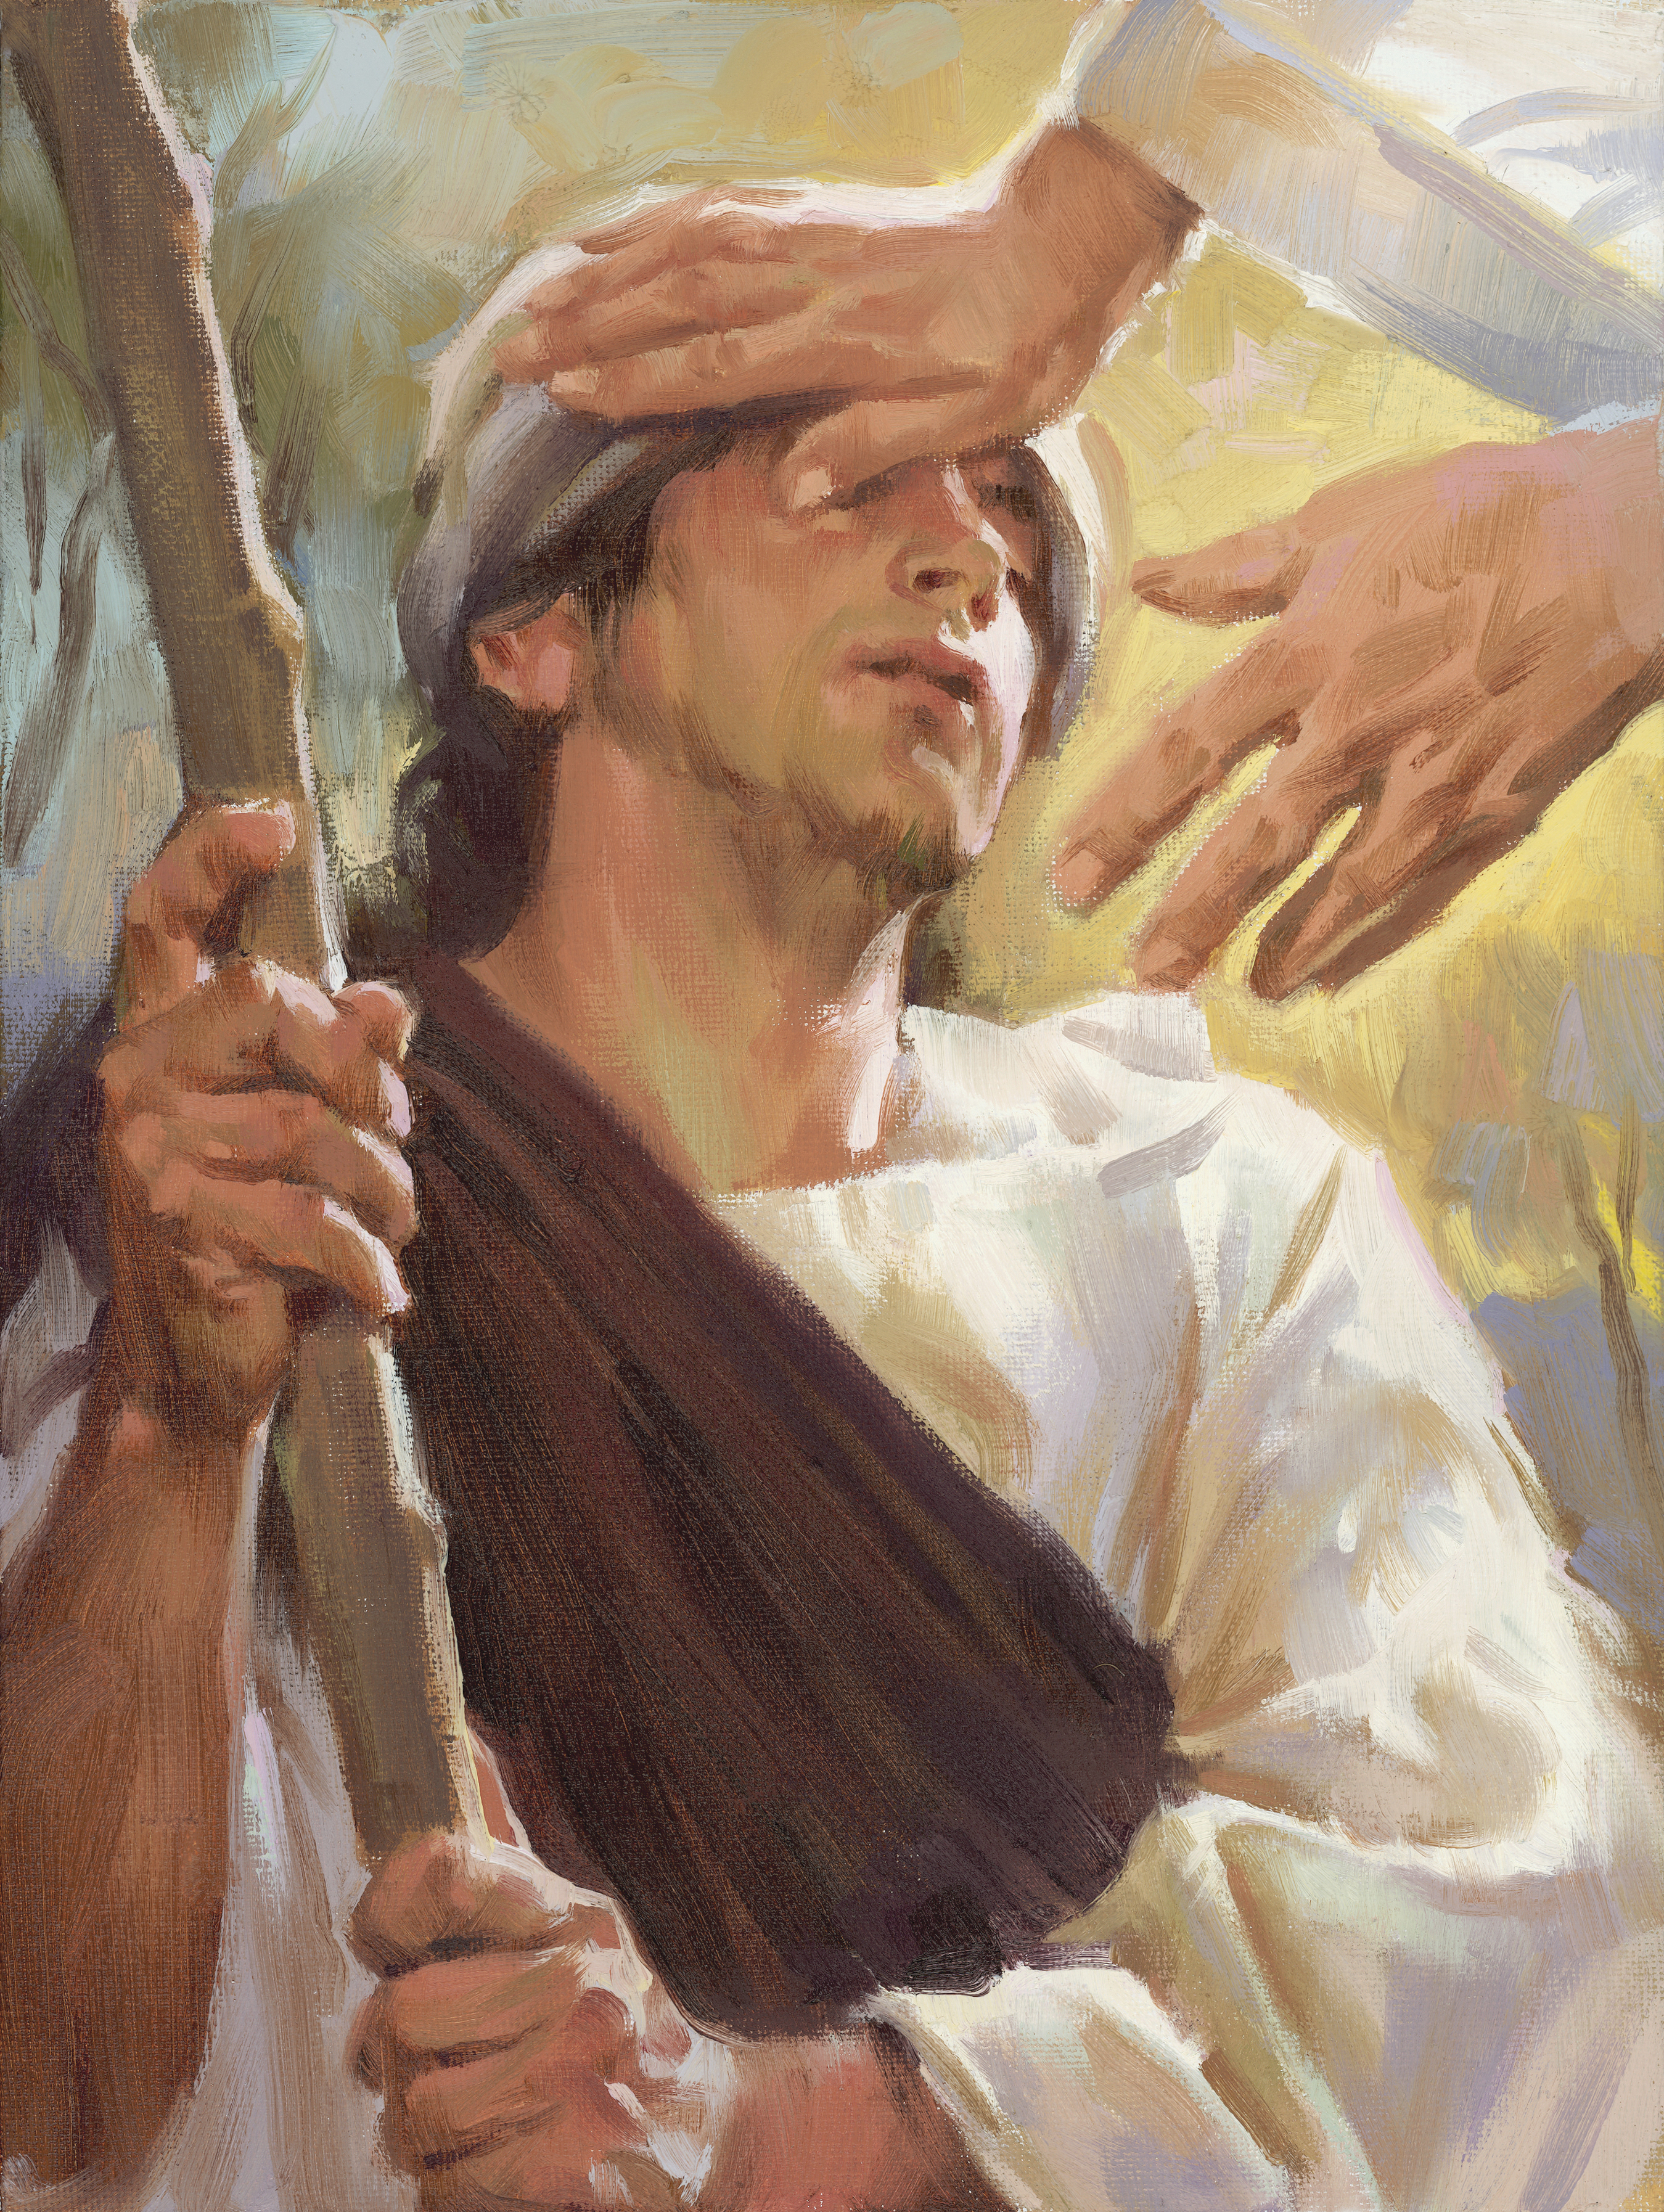 Christ Healing a Blind Man, by Sam Lawlor